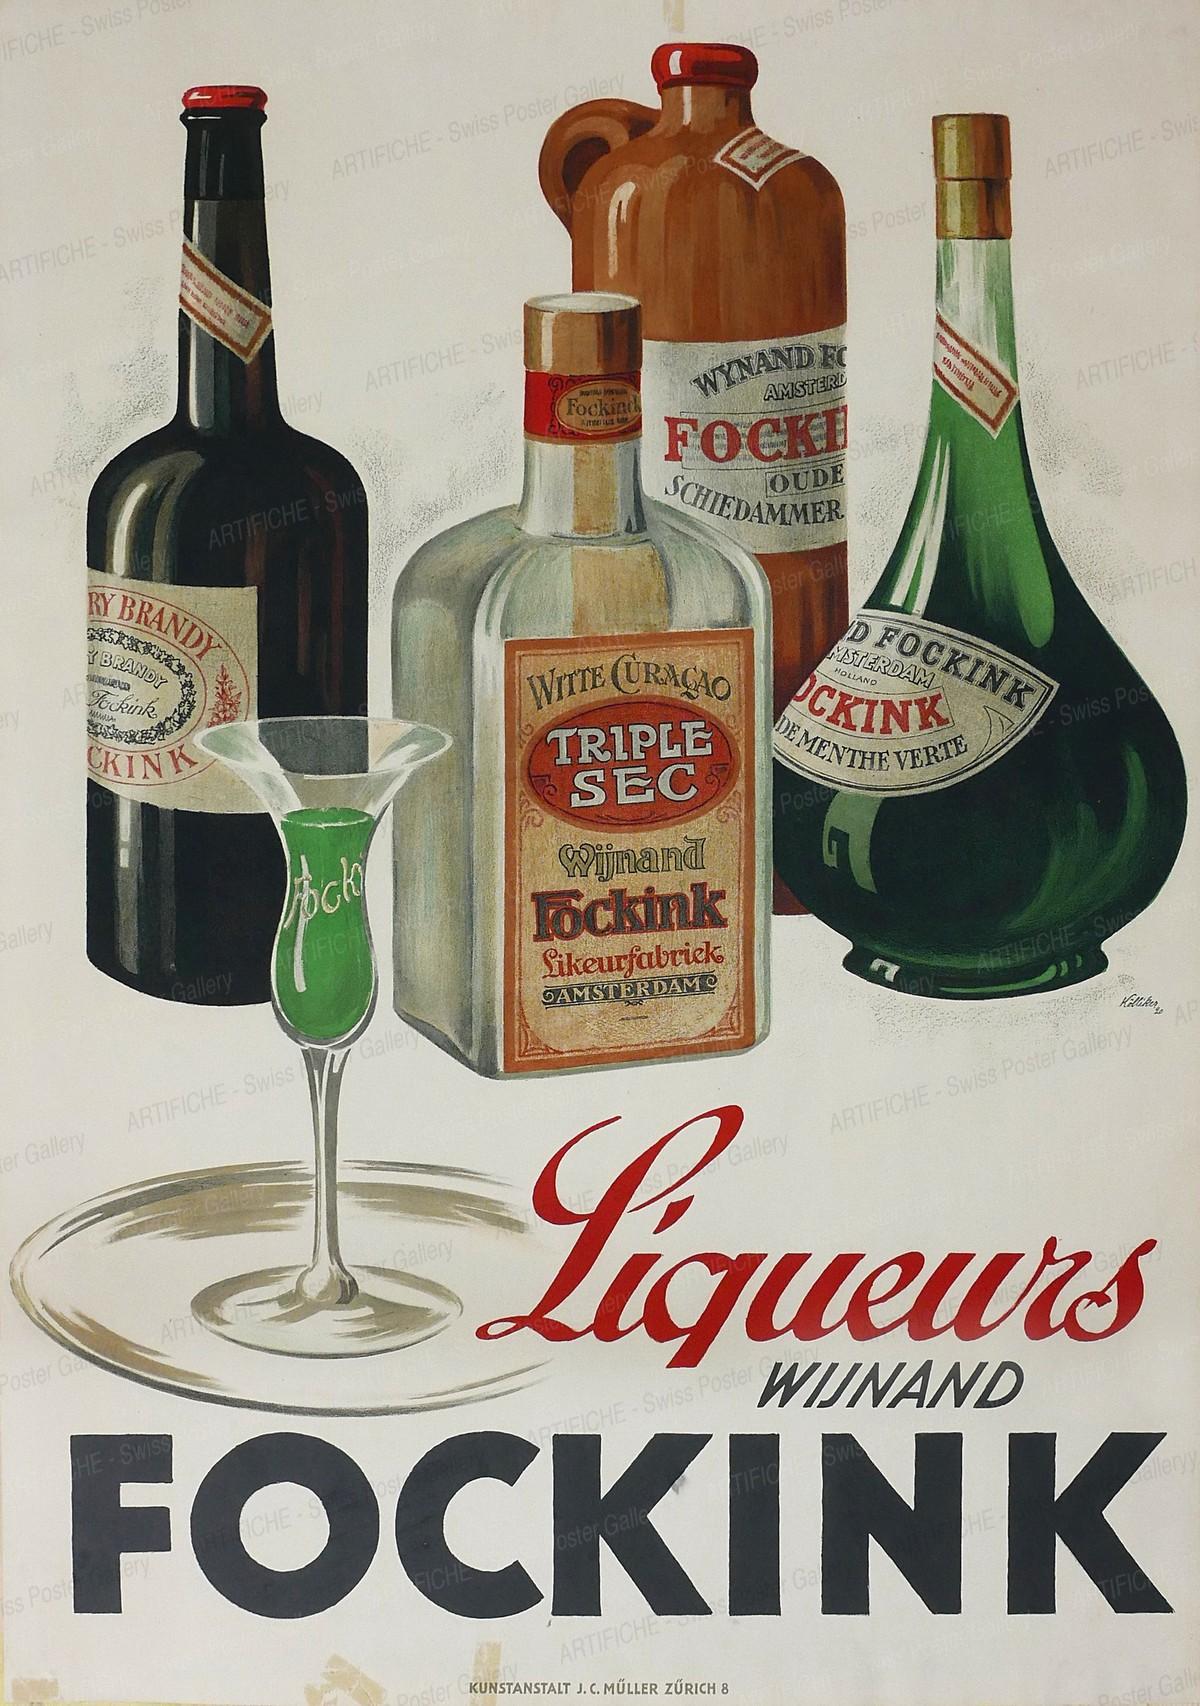 Liqueurs Wijnand Fockink, Hermann Alfred Koelliker